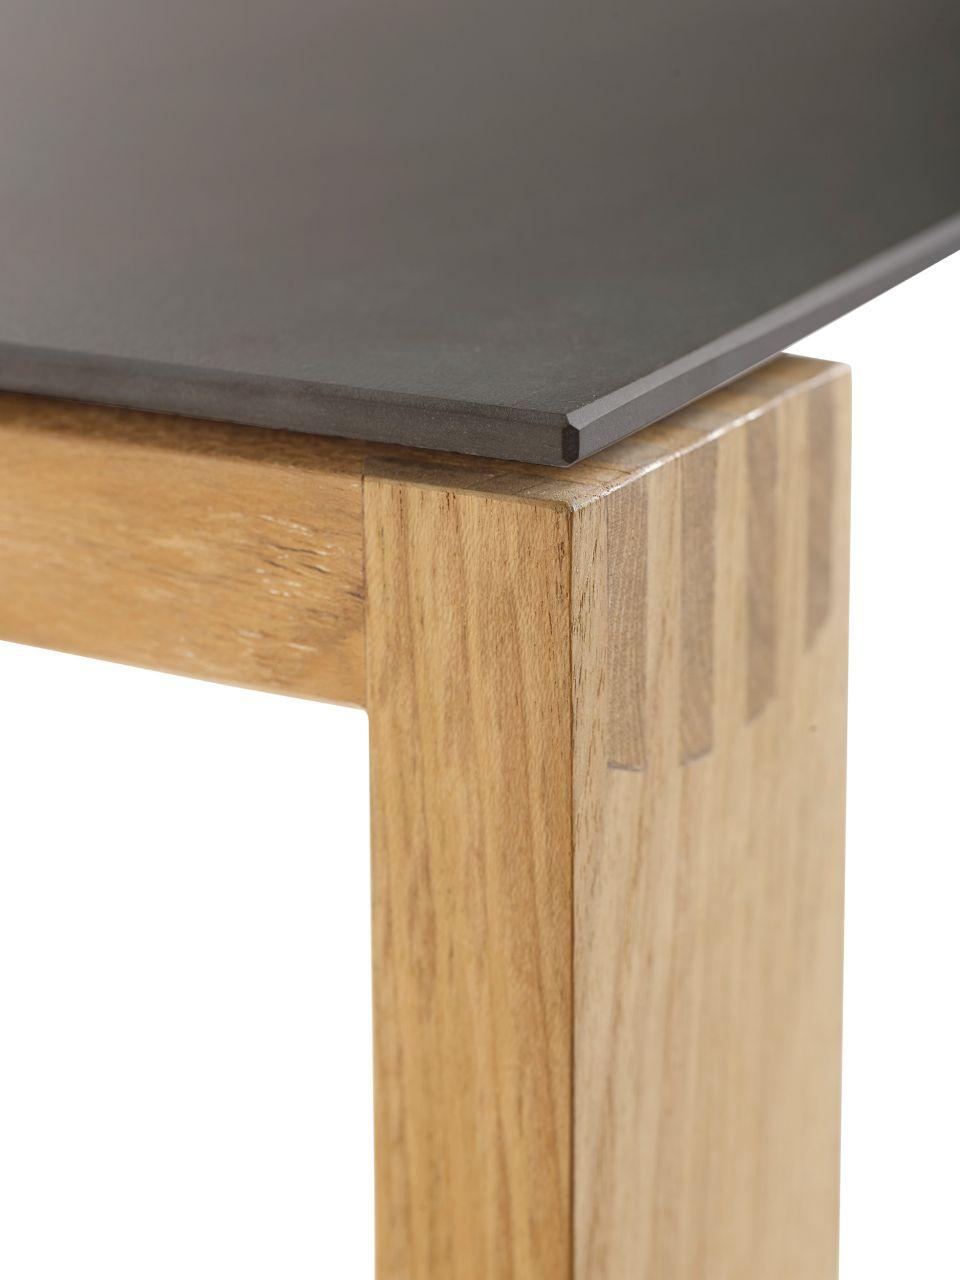 Detailbild Solpuri Gartentisch Safari mit Keramik-Tischplatte